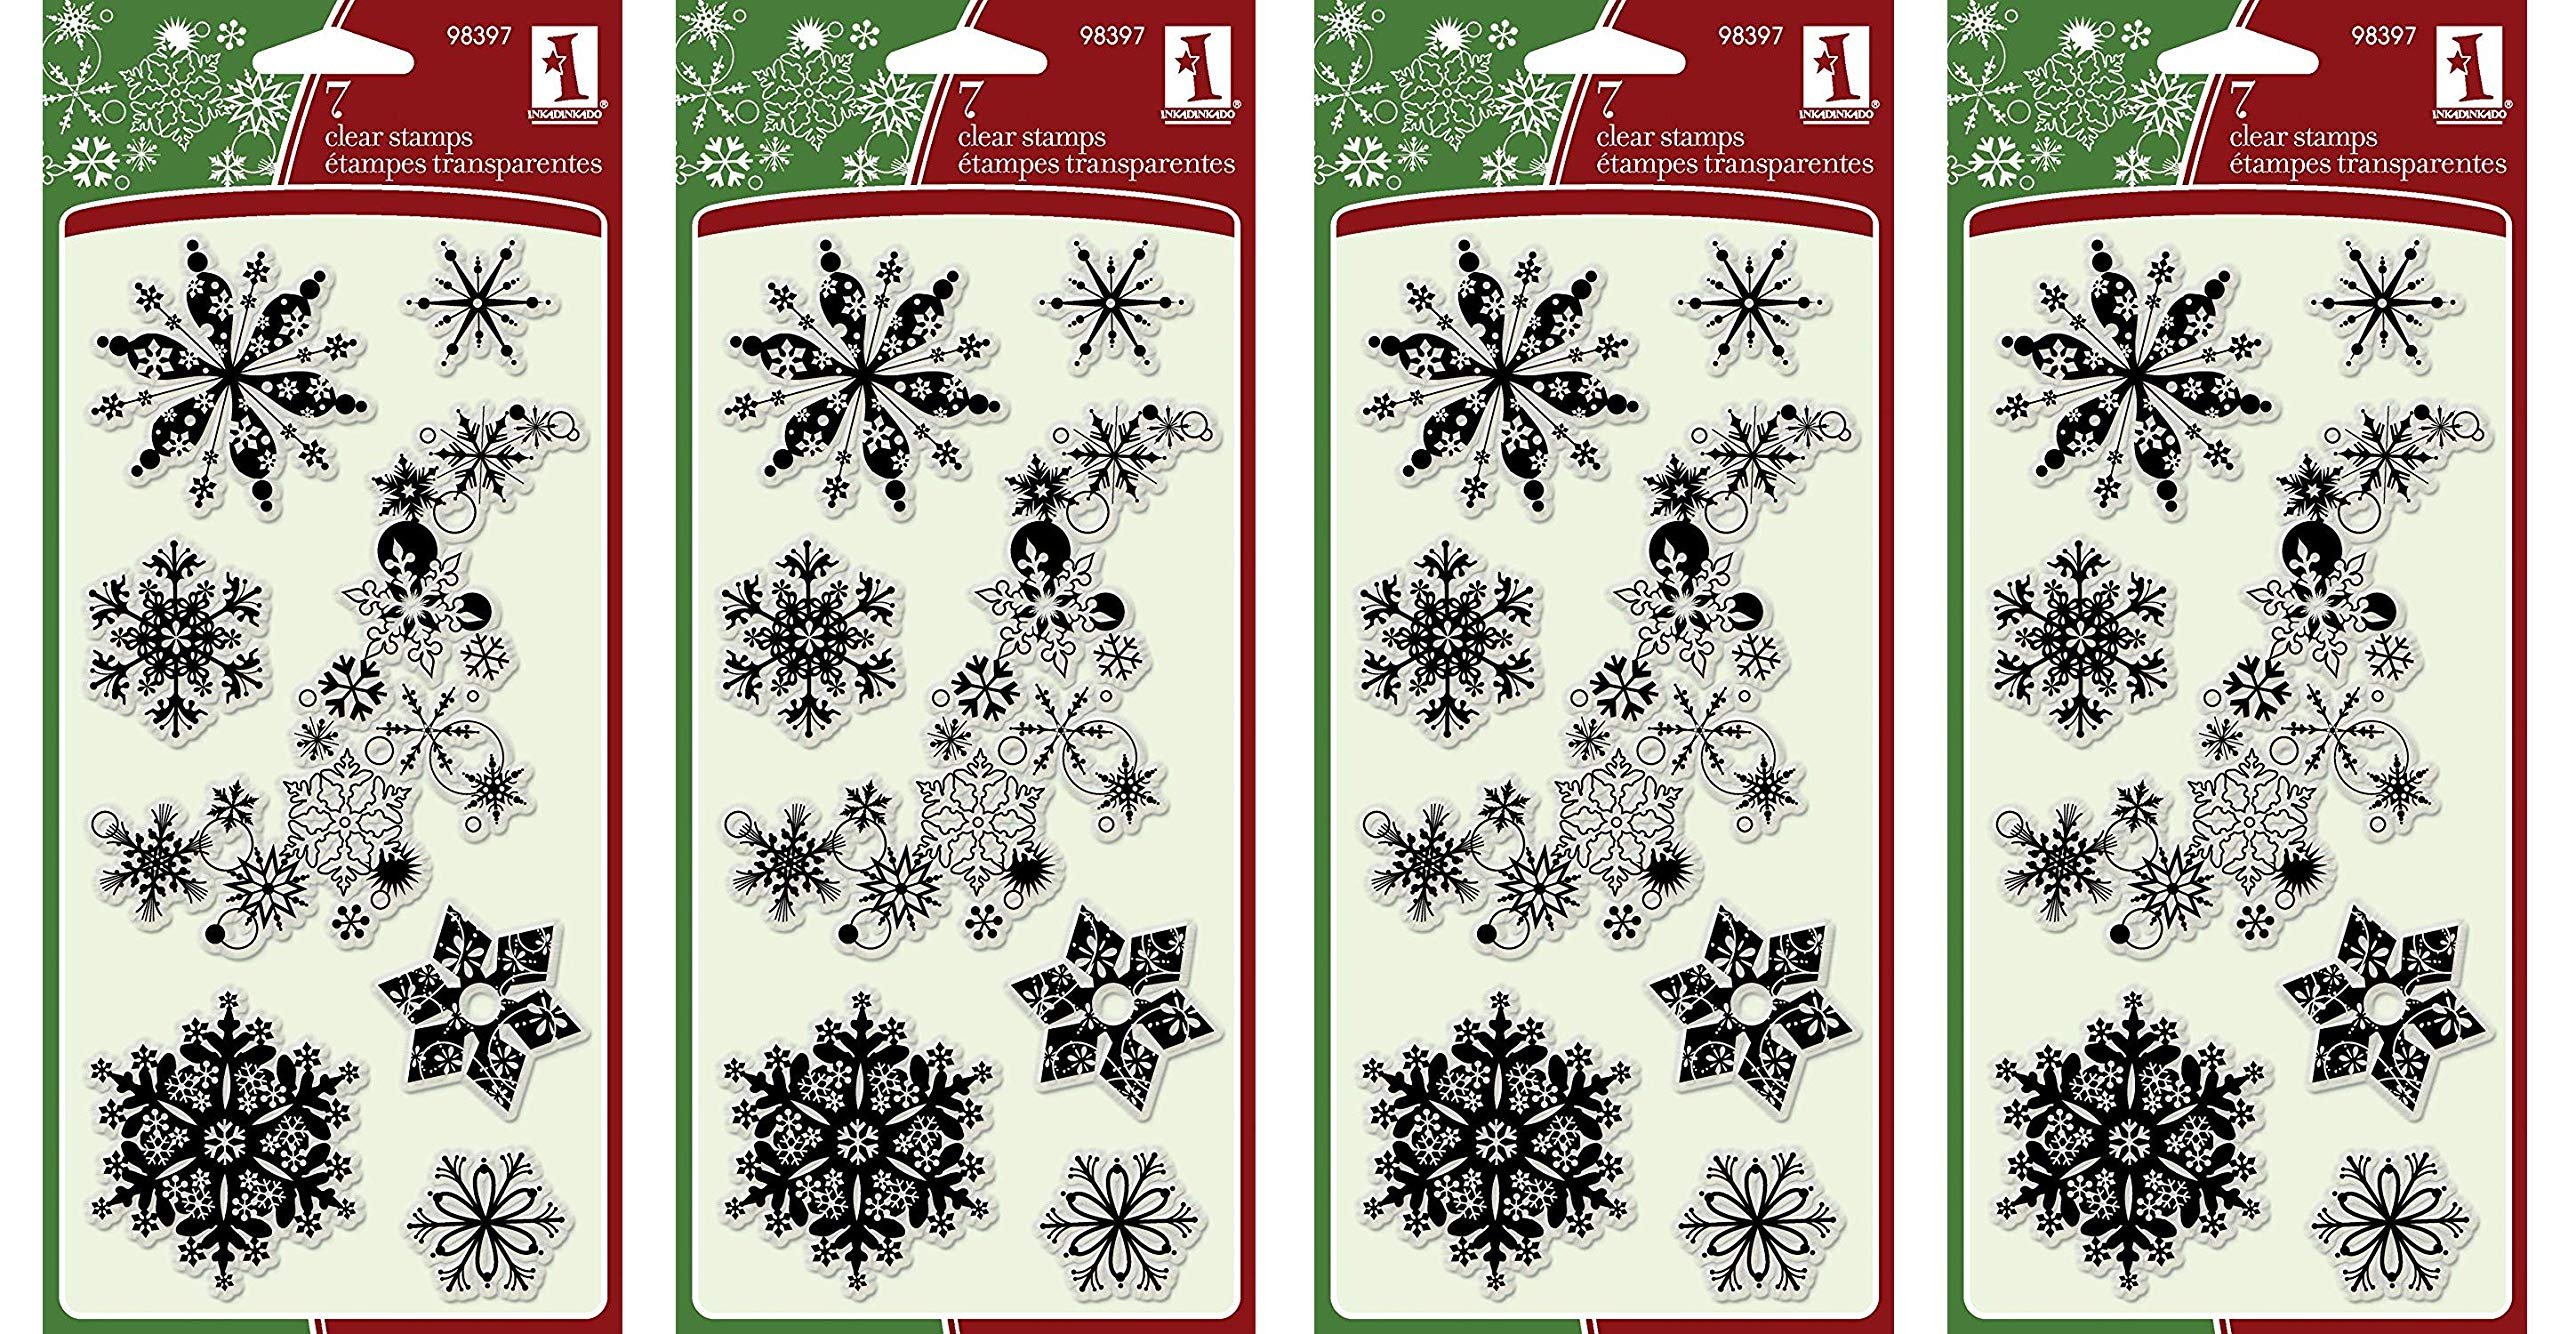 Inkadinkado 7-Piece Snowflakes A-Plenty Clear Stamp (4-(Pack))